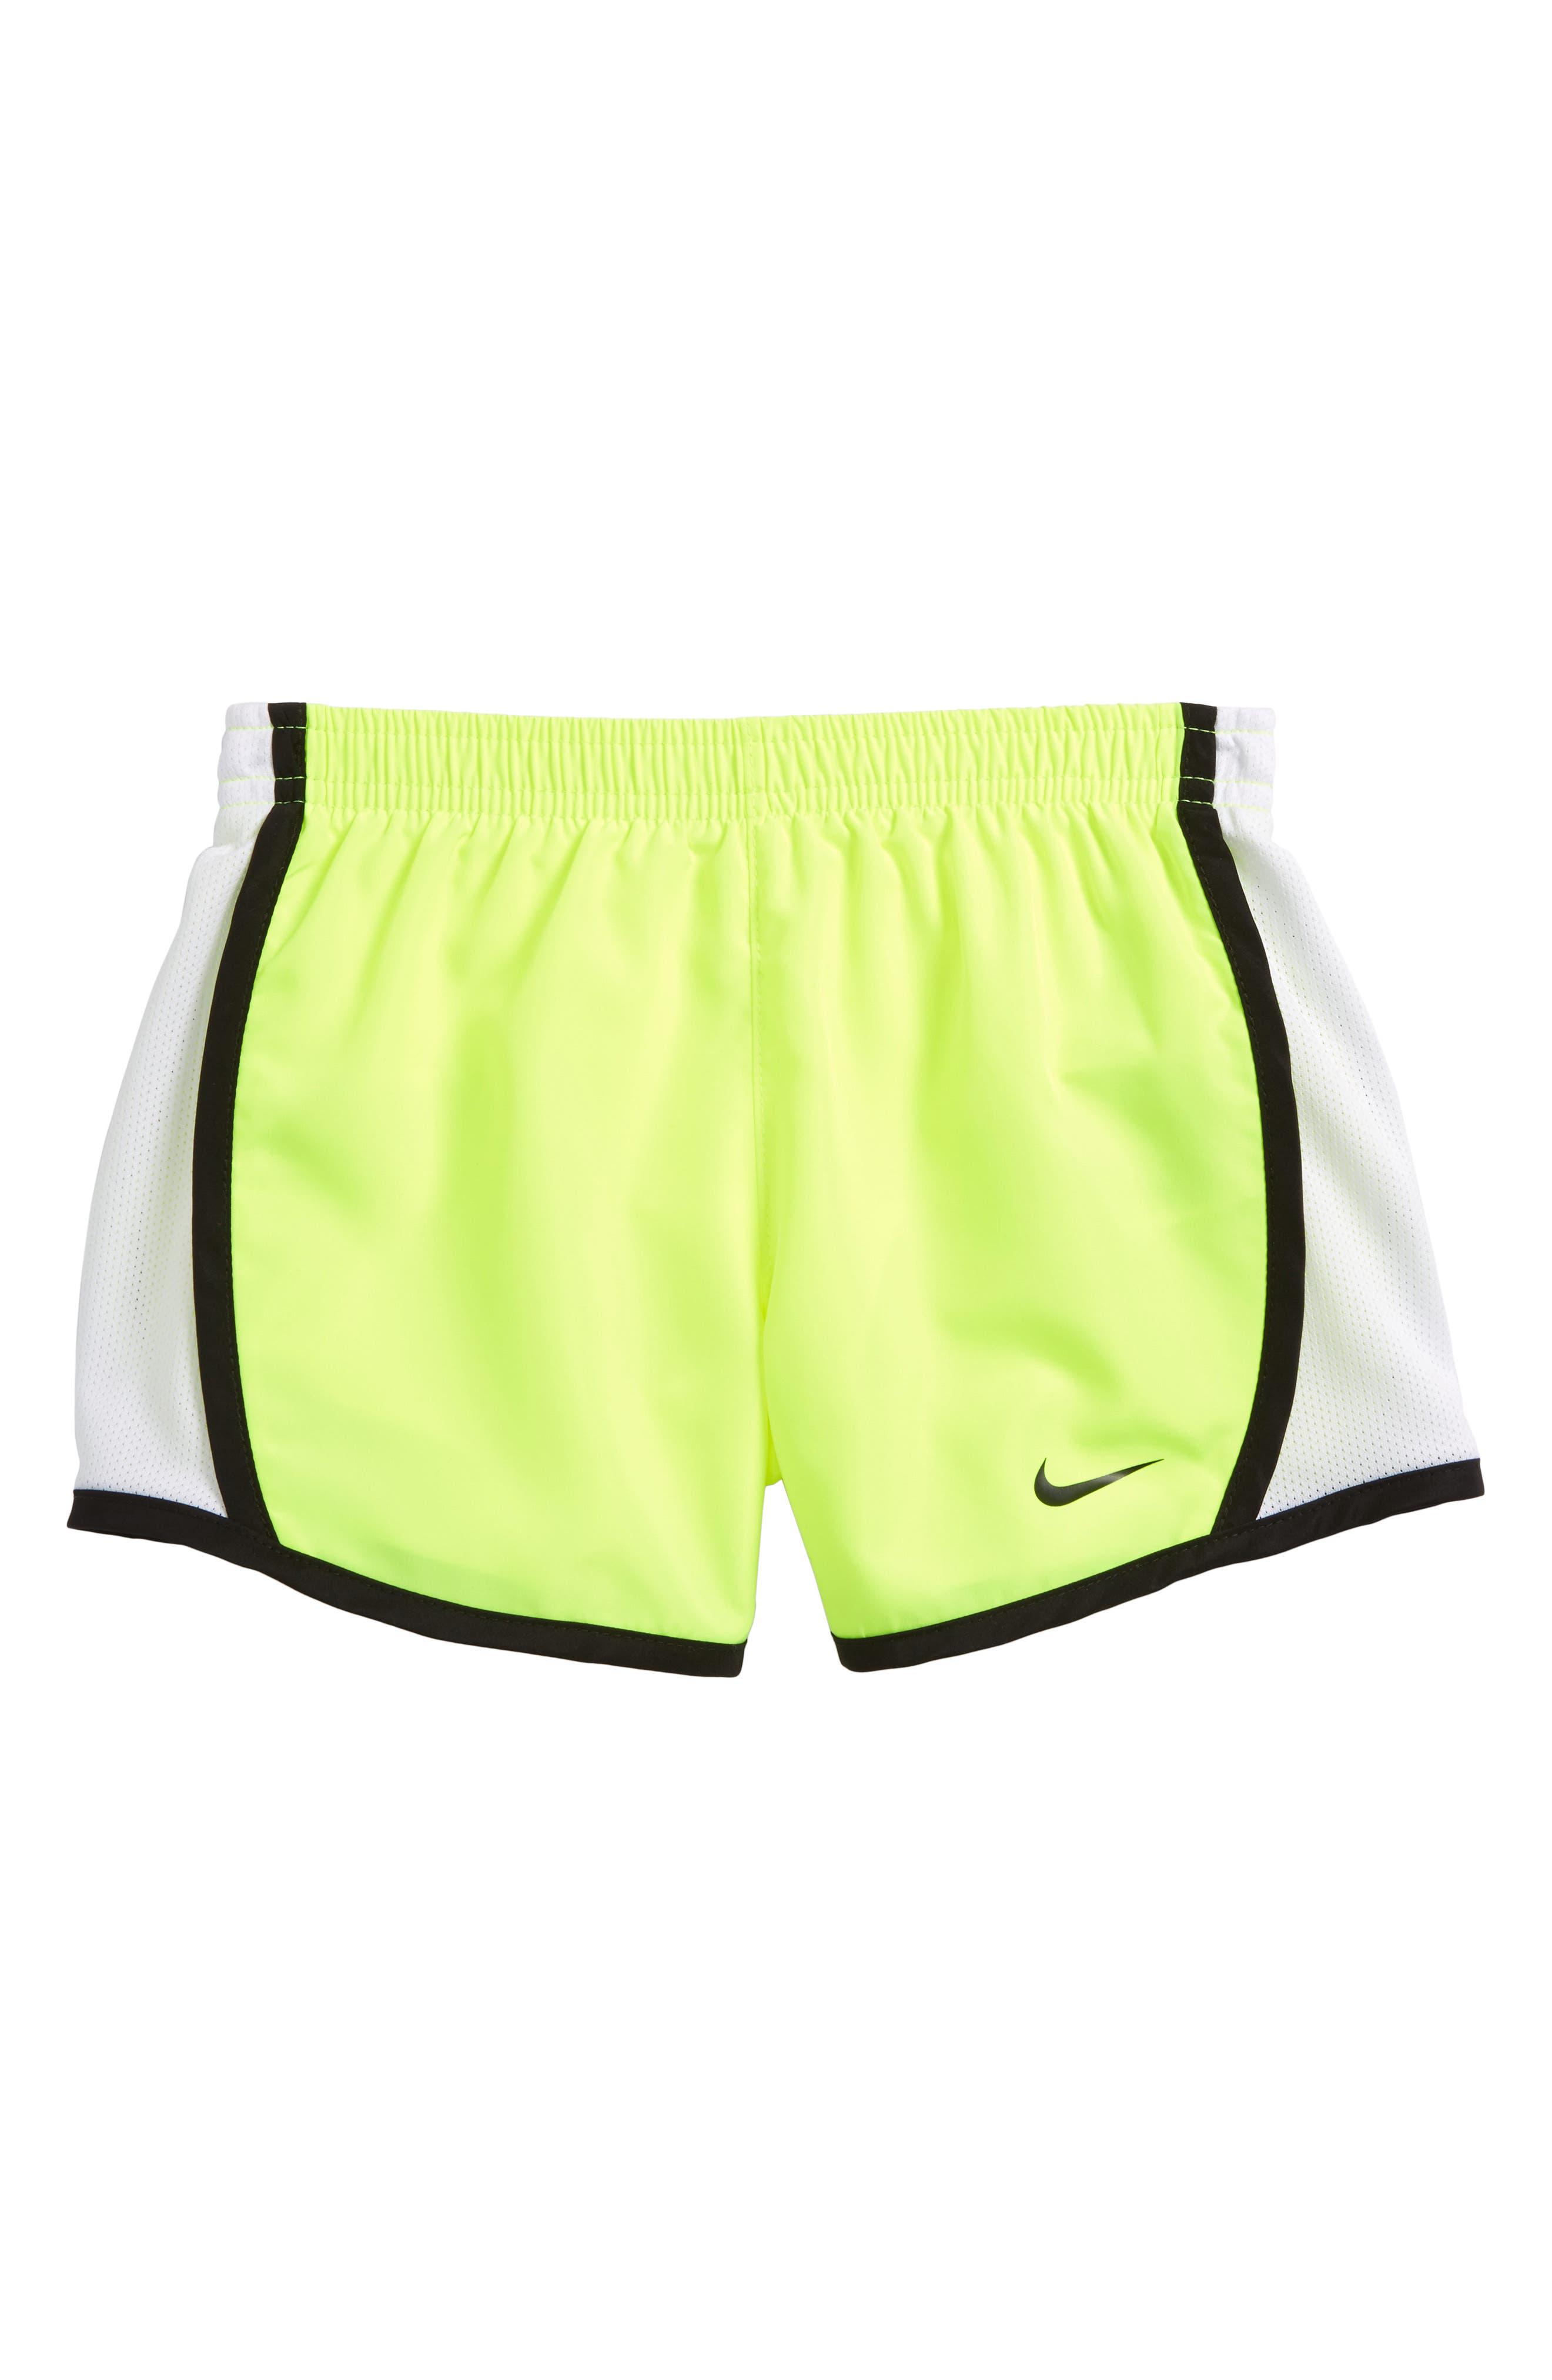 'Tempo' Dri-FIT Athletic Shorts,                             Main thumbnail 1, color,                             300